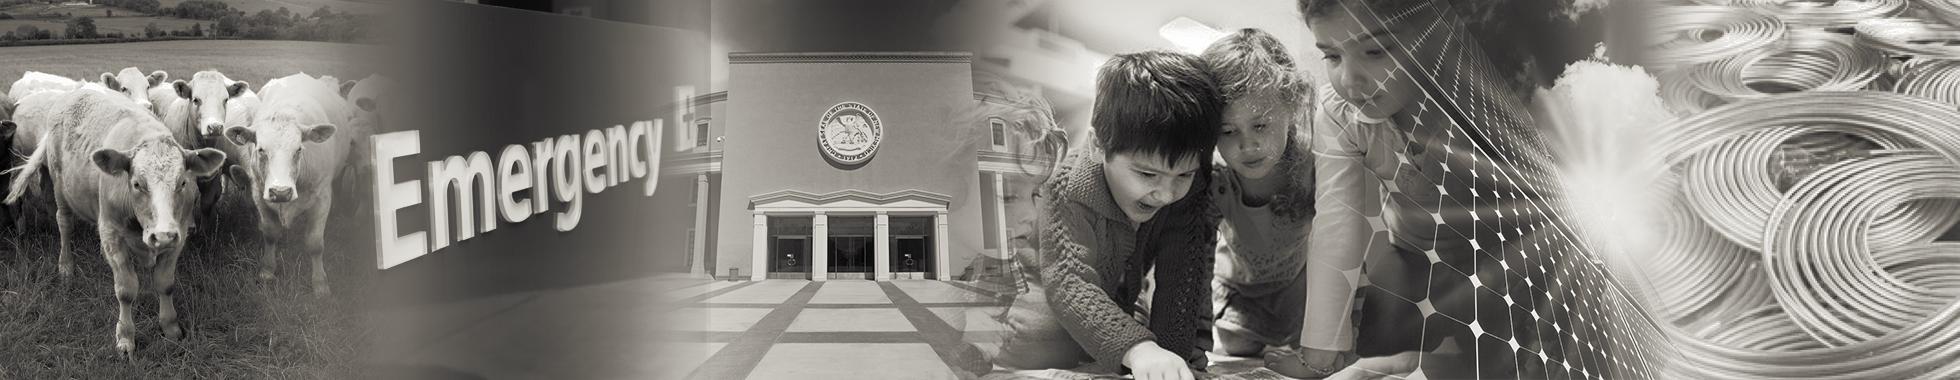 healthcare New Mexico Legislature education alternative energy